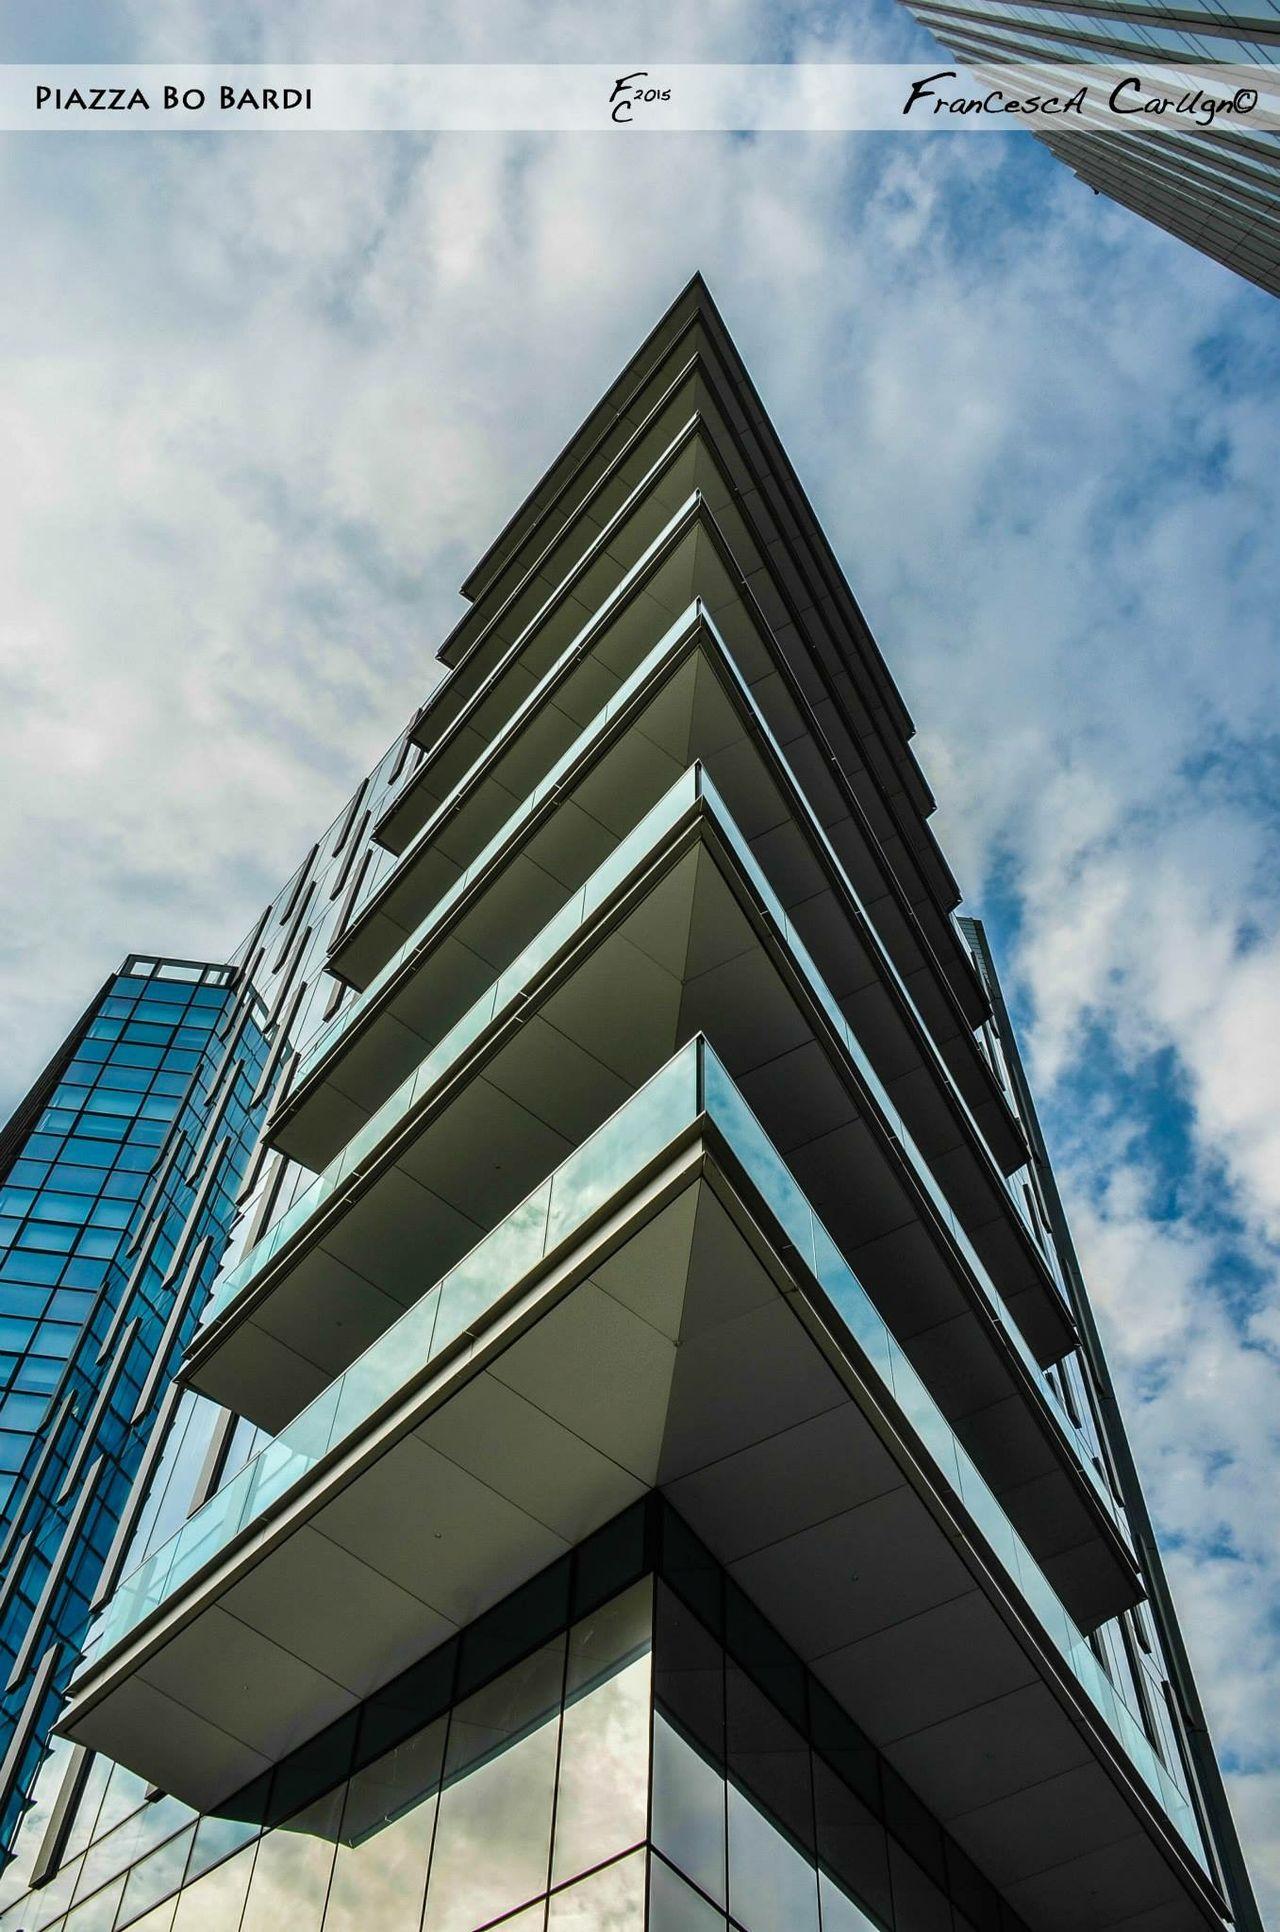 Architecture Urban Geometry Architectural Detail Compositions Skyscraper Design Prospective